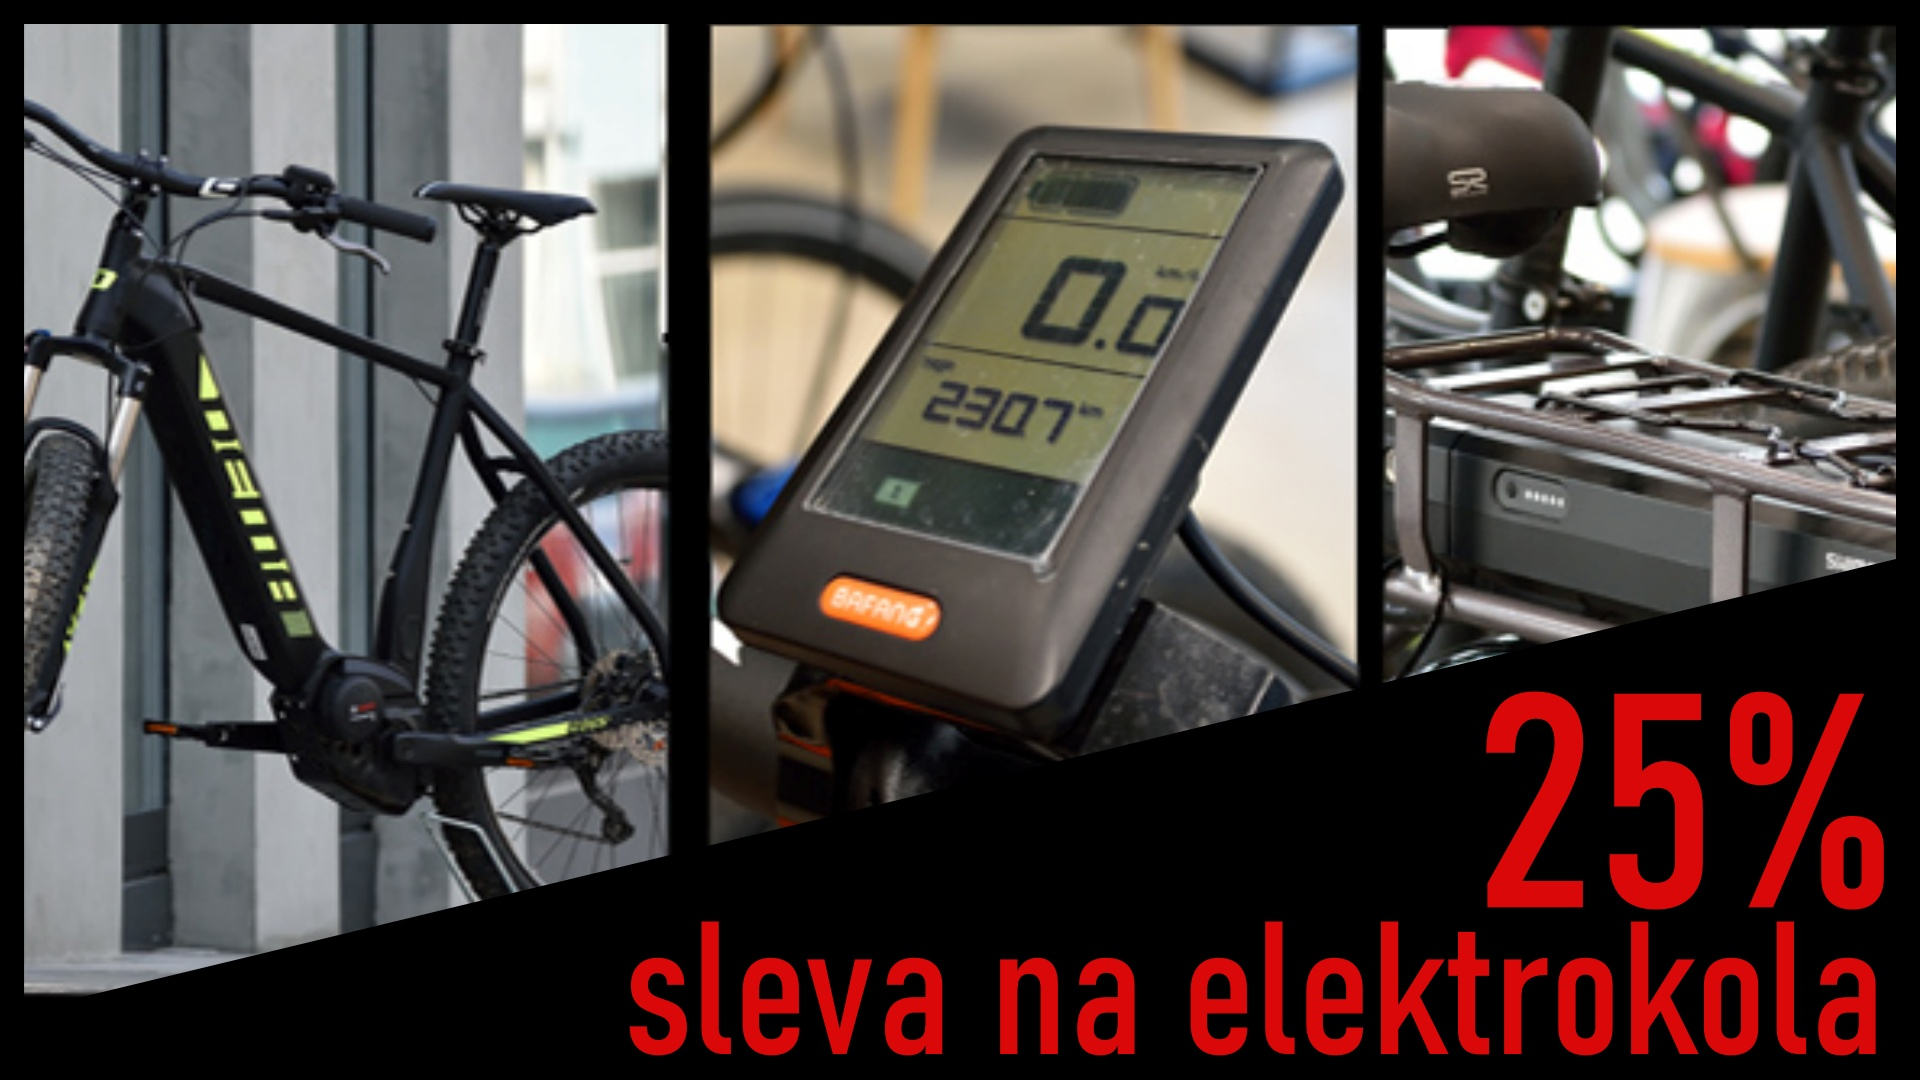 Sleva 25% ne elektrokola!